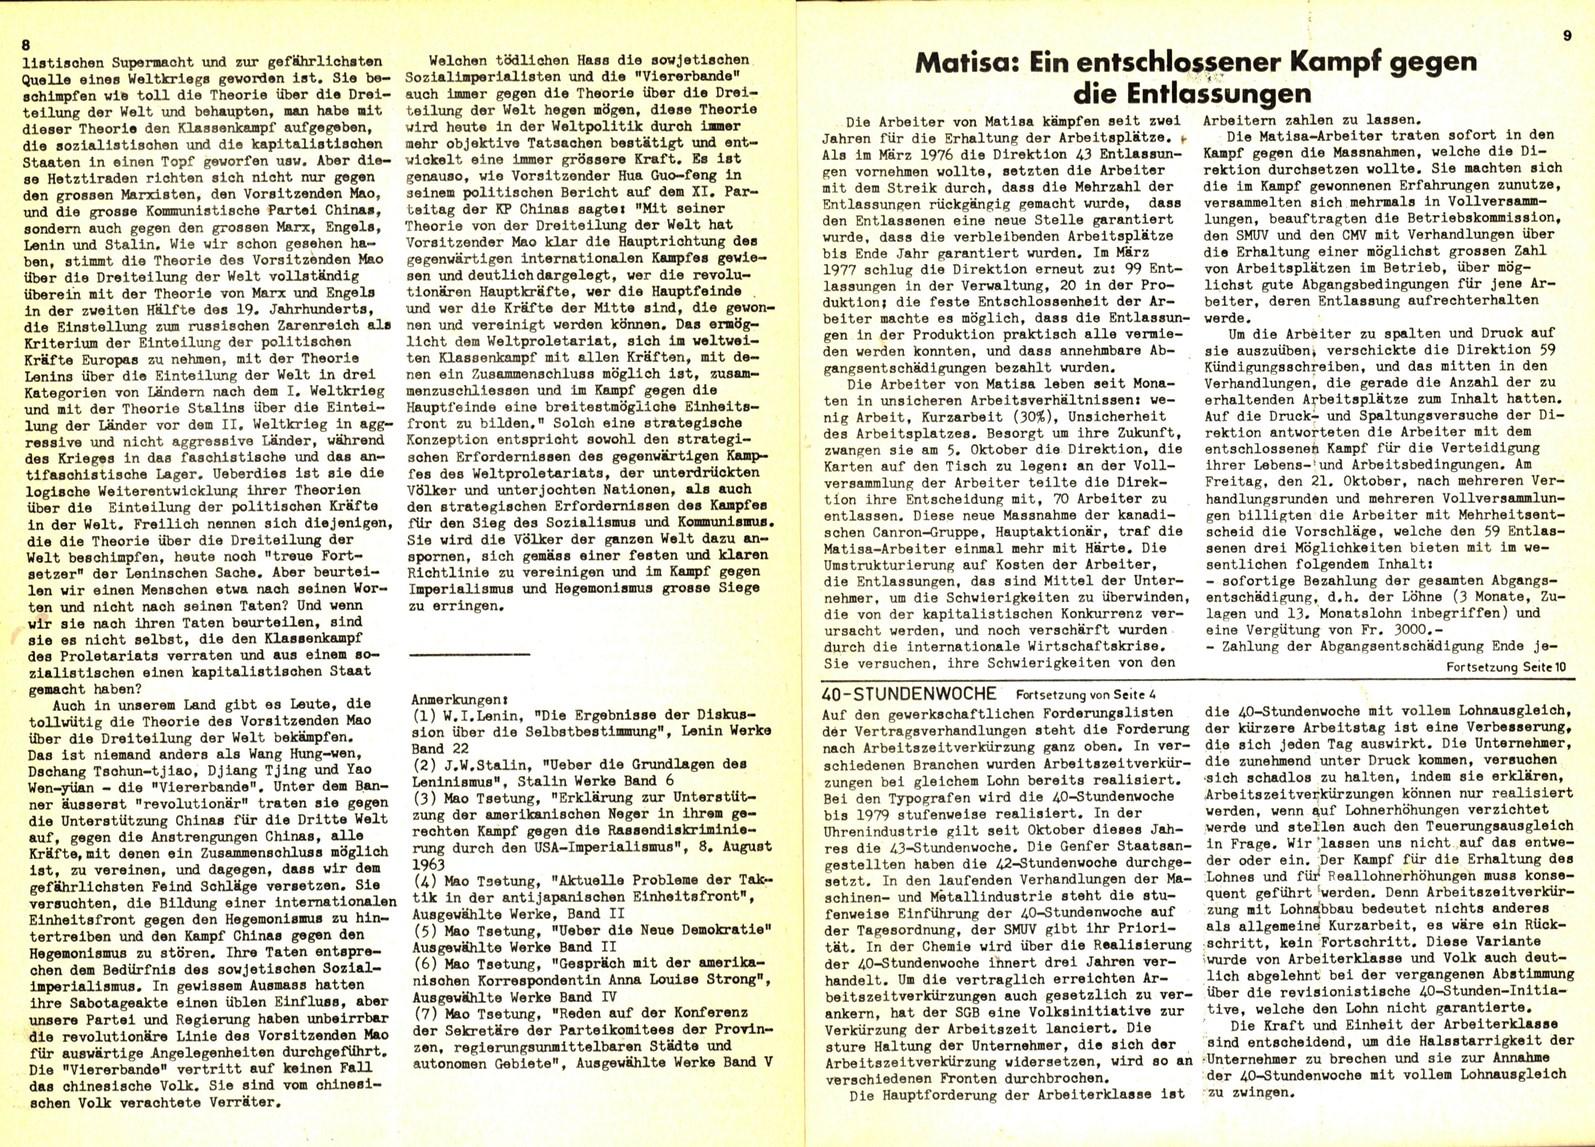 Schweiz_KPSML_Oktober_19771200_117_005